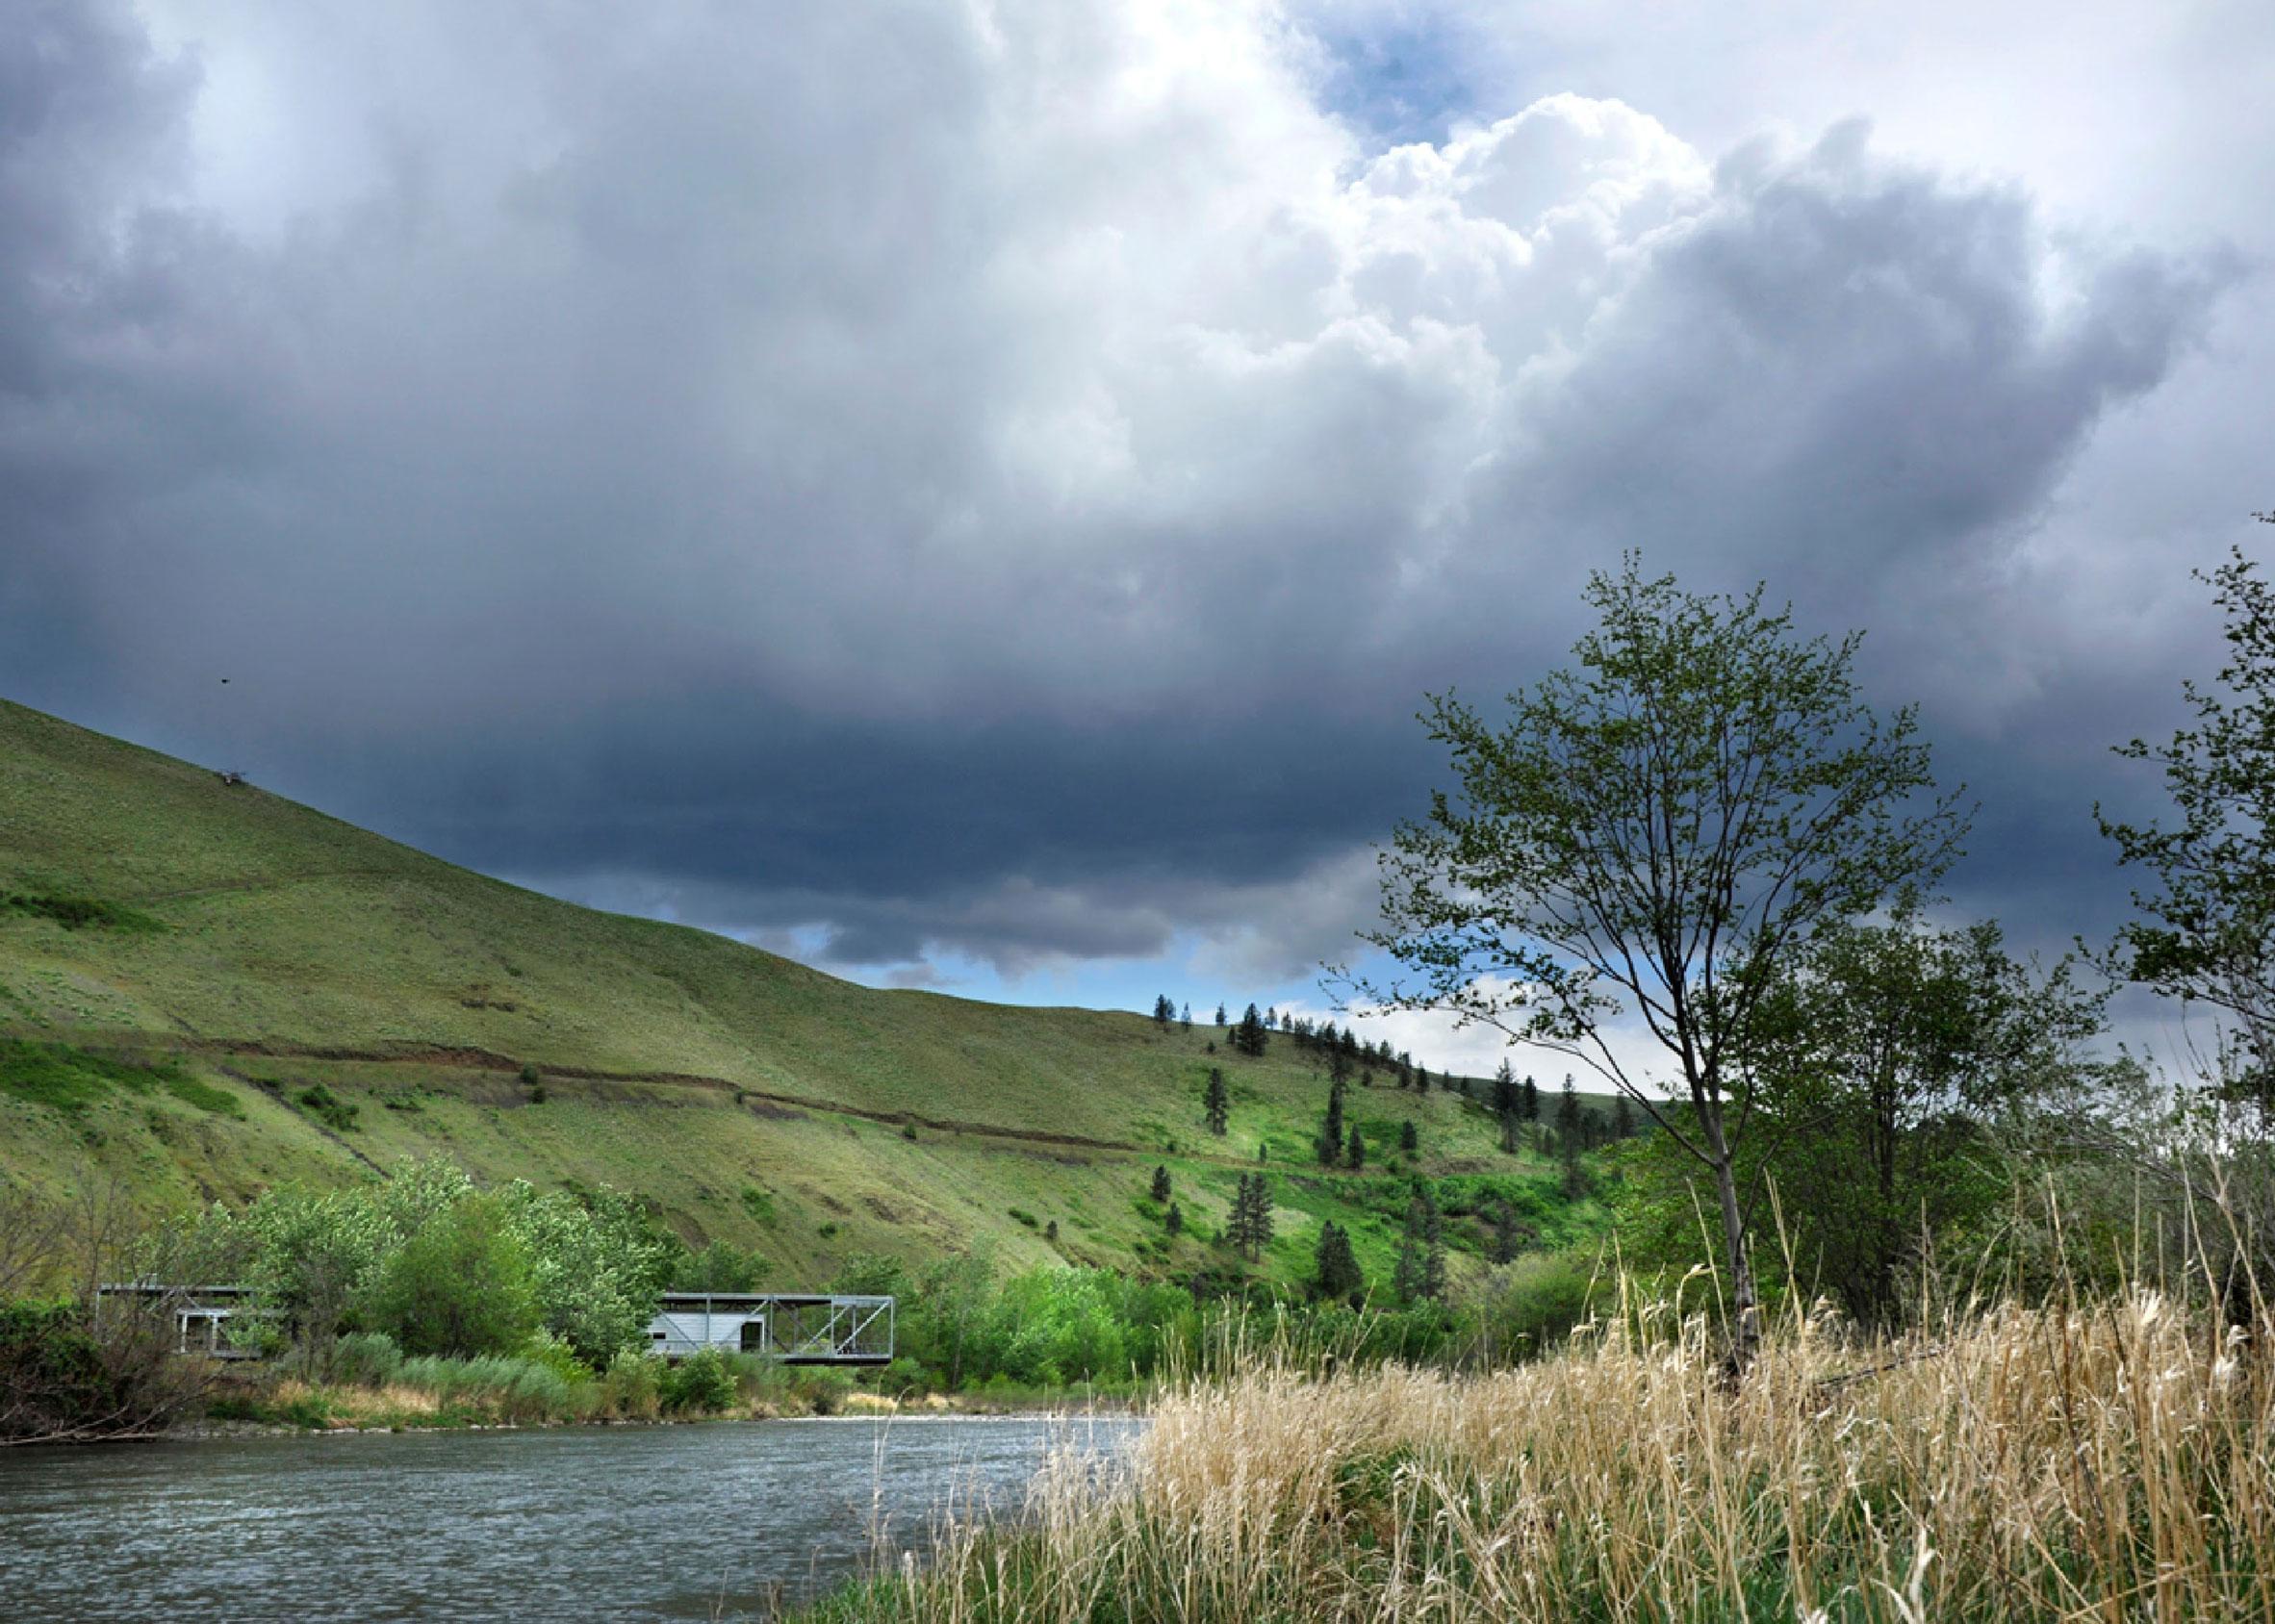 Flood Plain House, Idaho, by Paul Hirzel